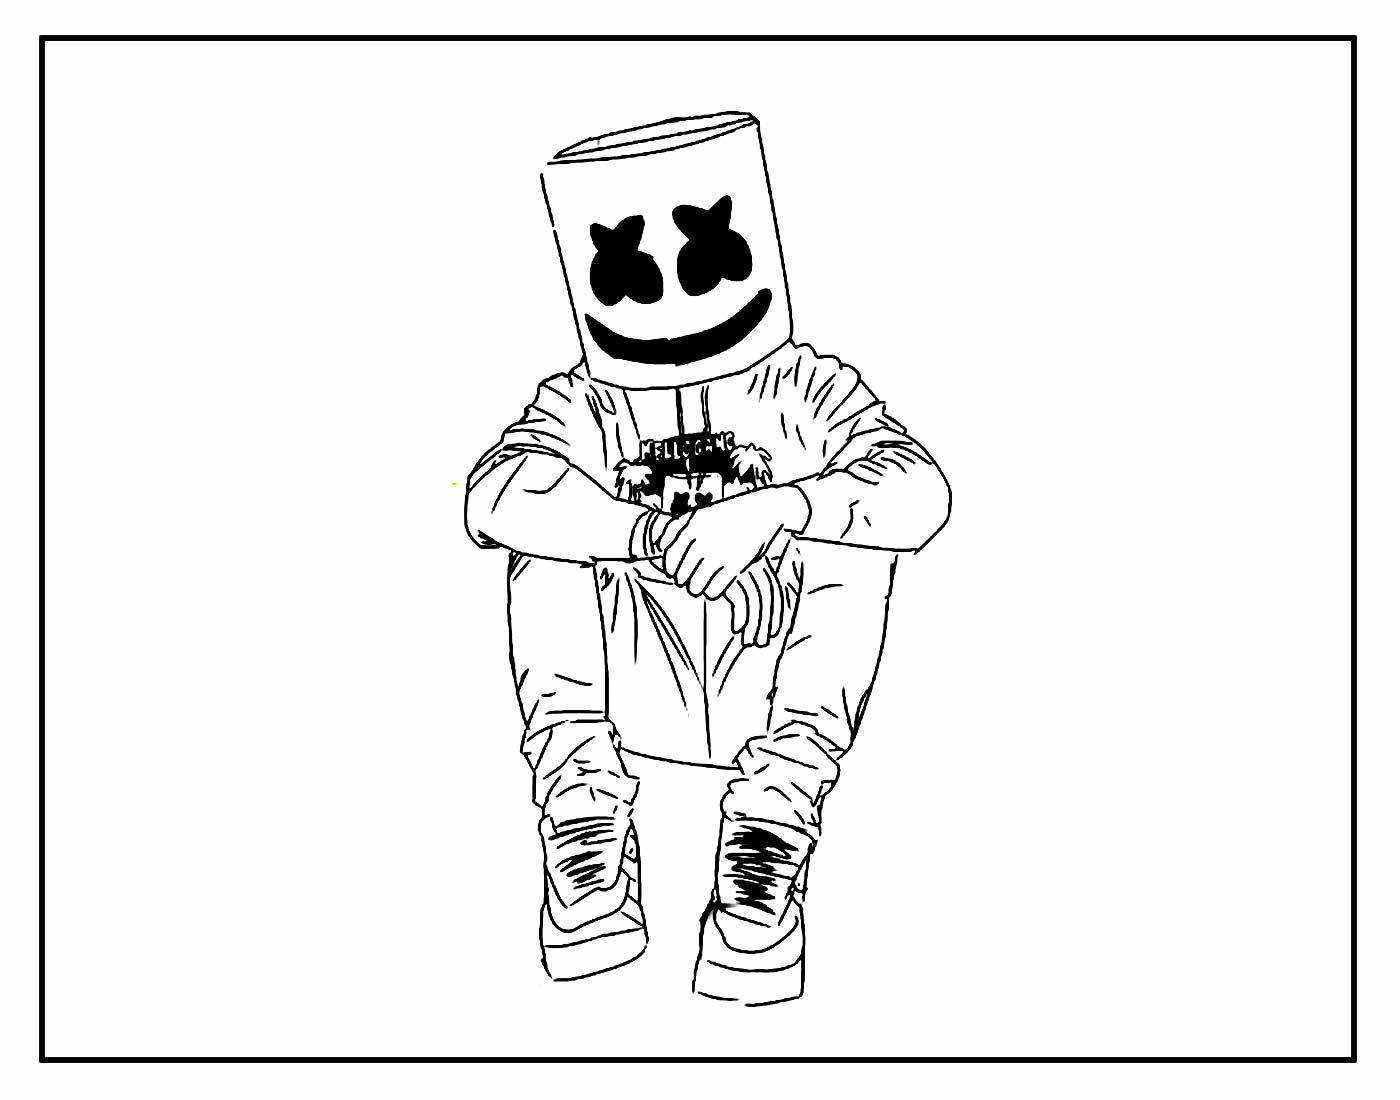 Página para colorir de Fortnite